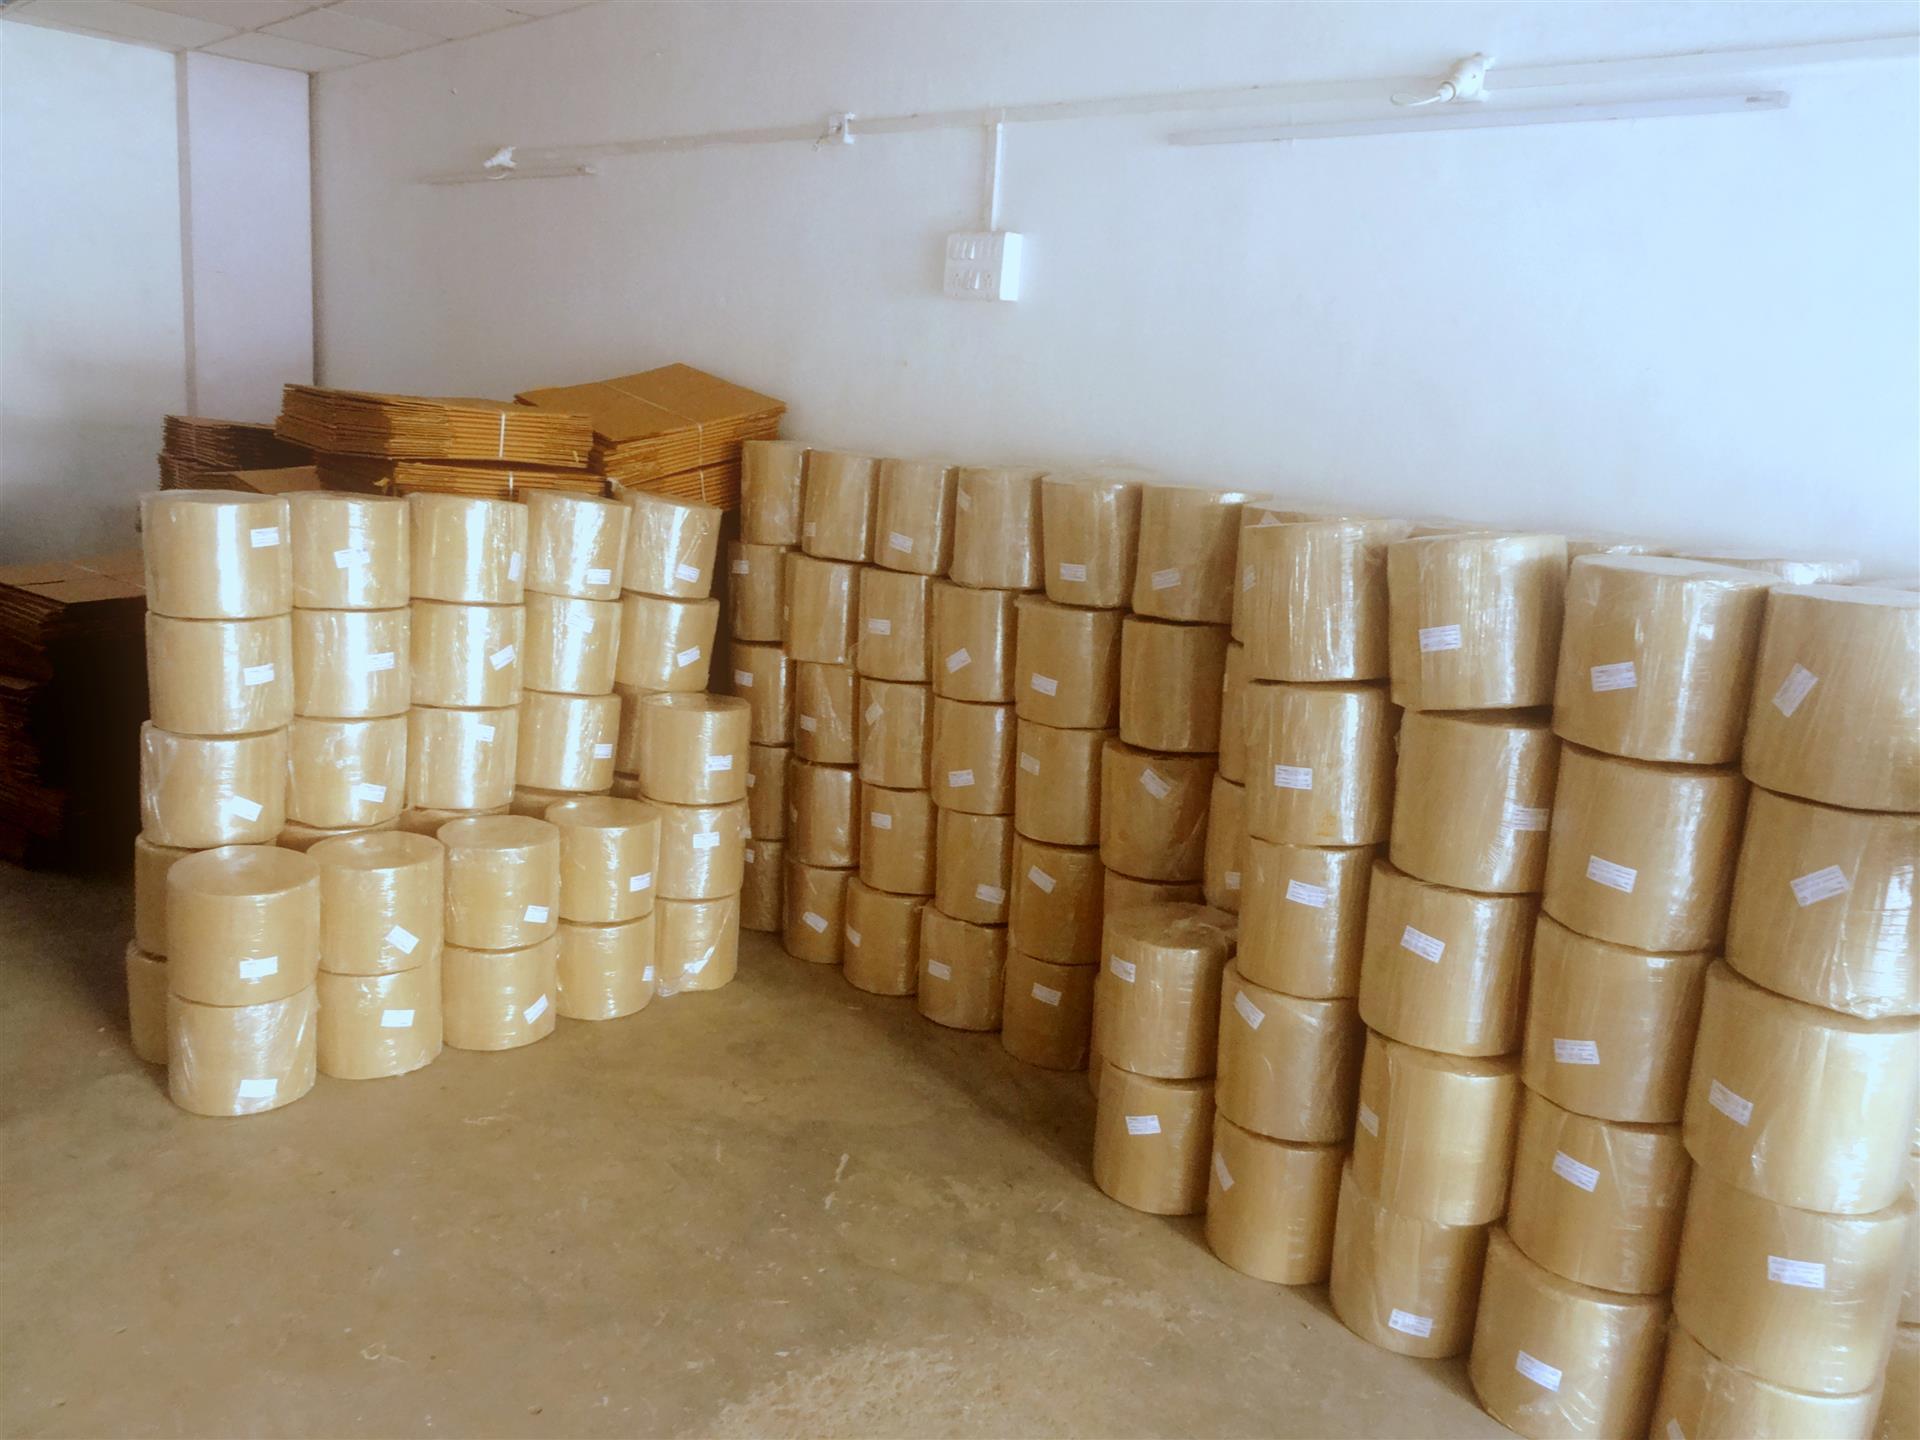 Image showing the Warehouse of Shree Krishna Enterprise